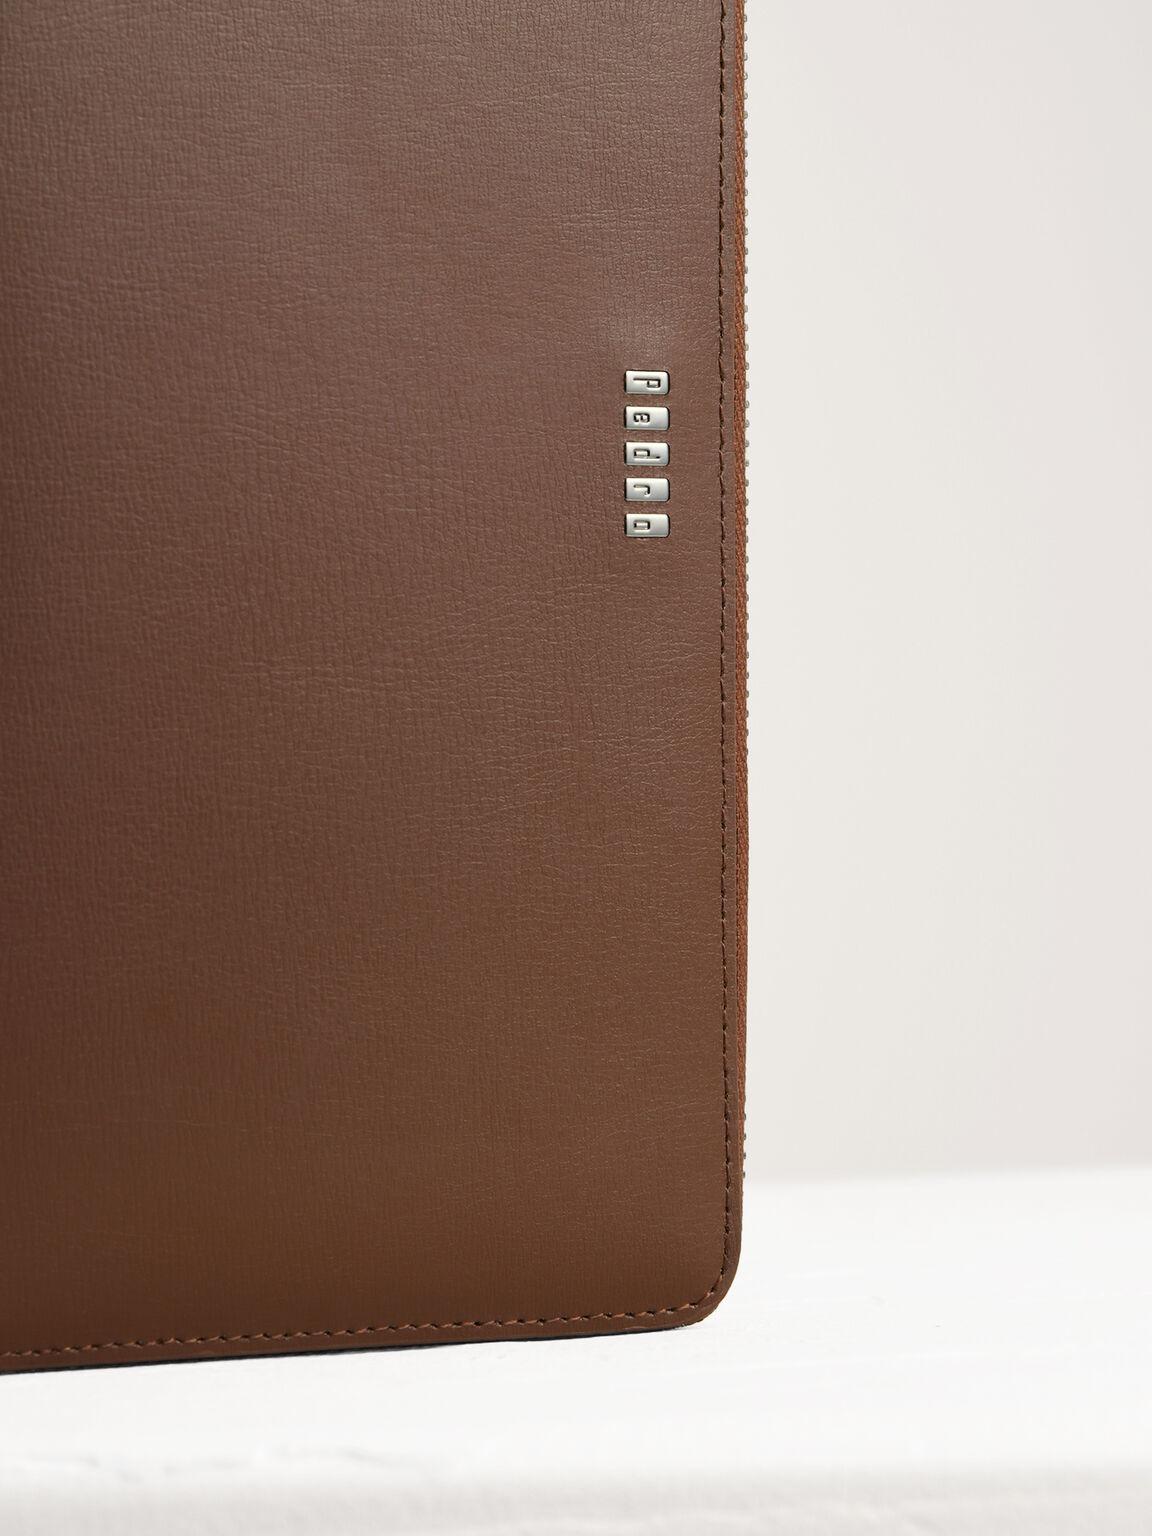 Leather Zip-Around Travel Organizer, Cognac, hi-res